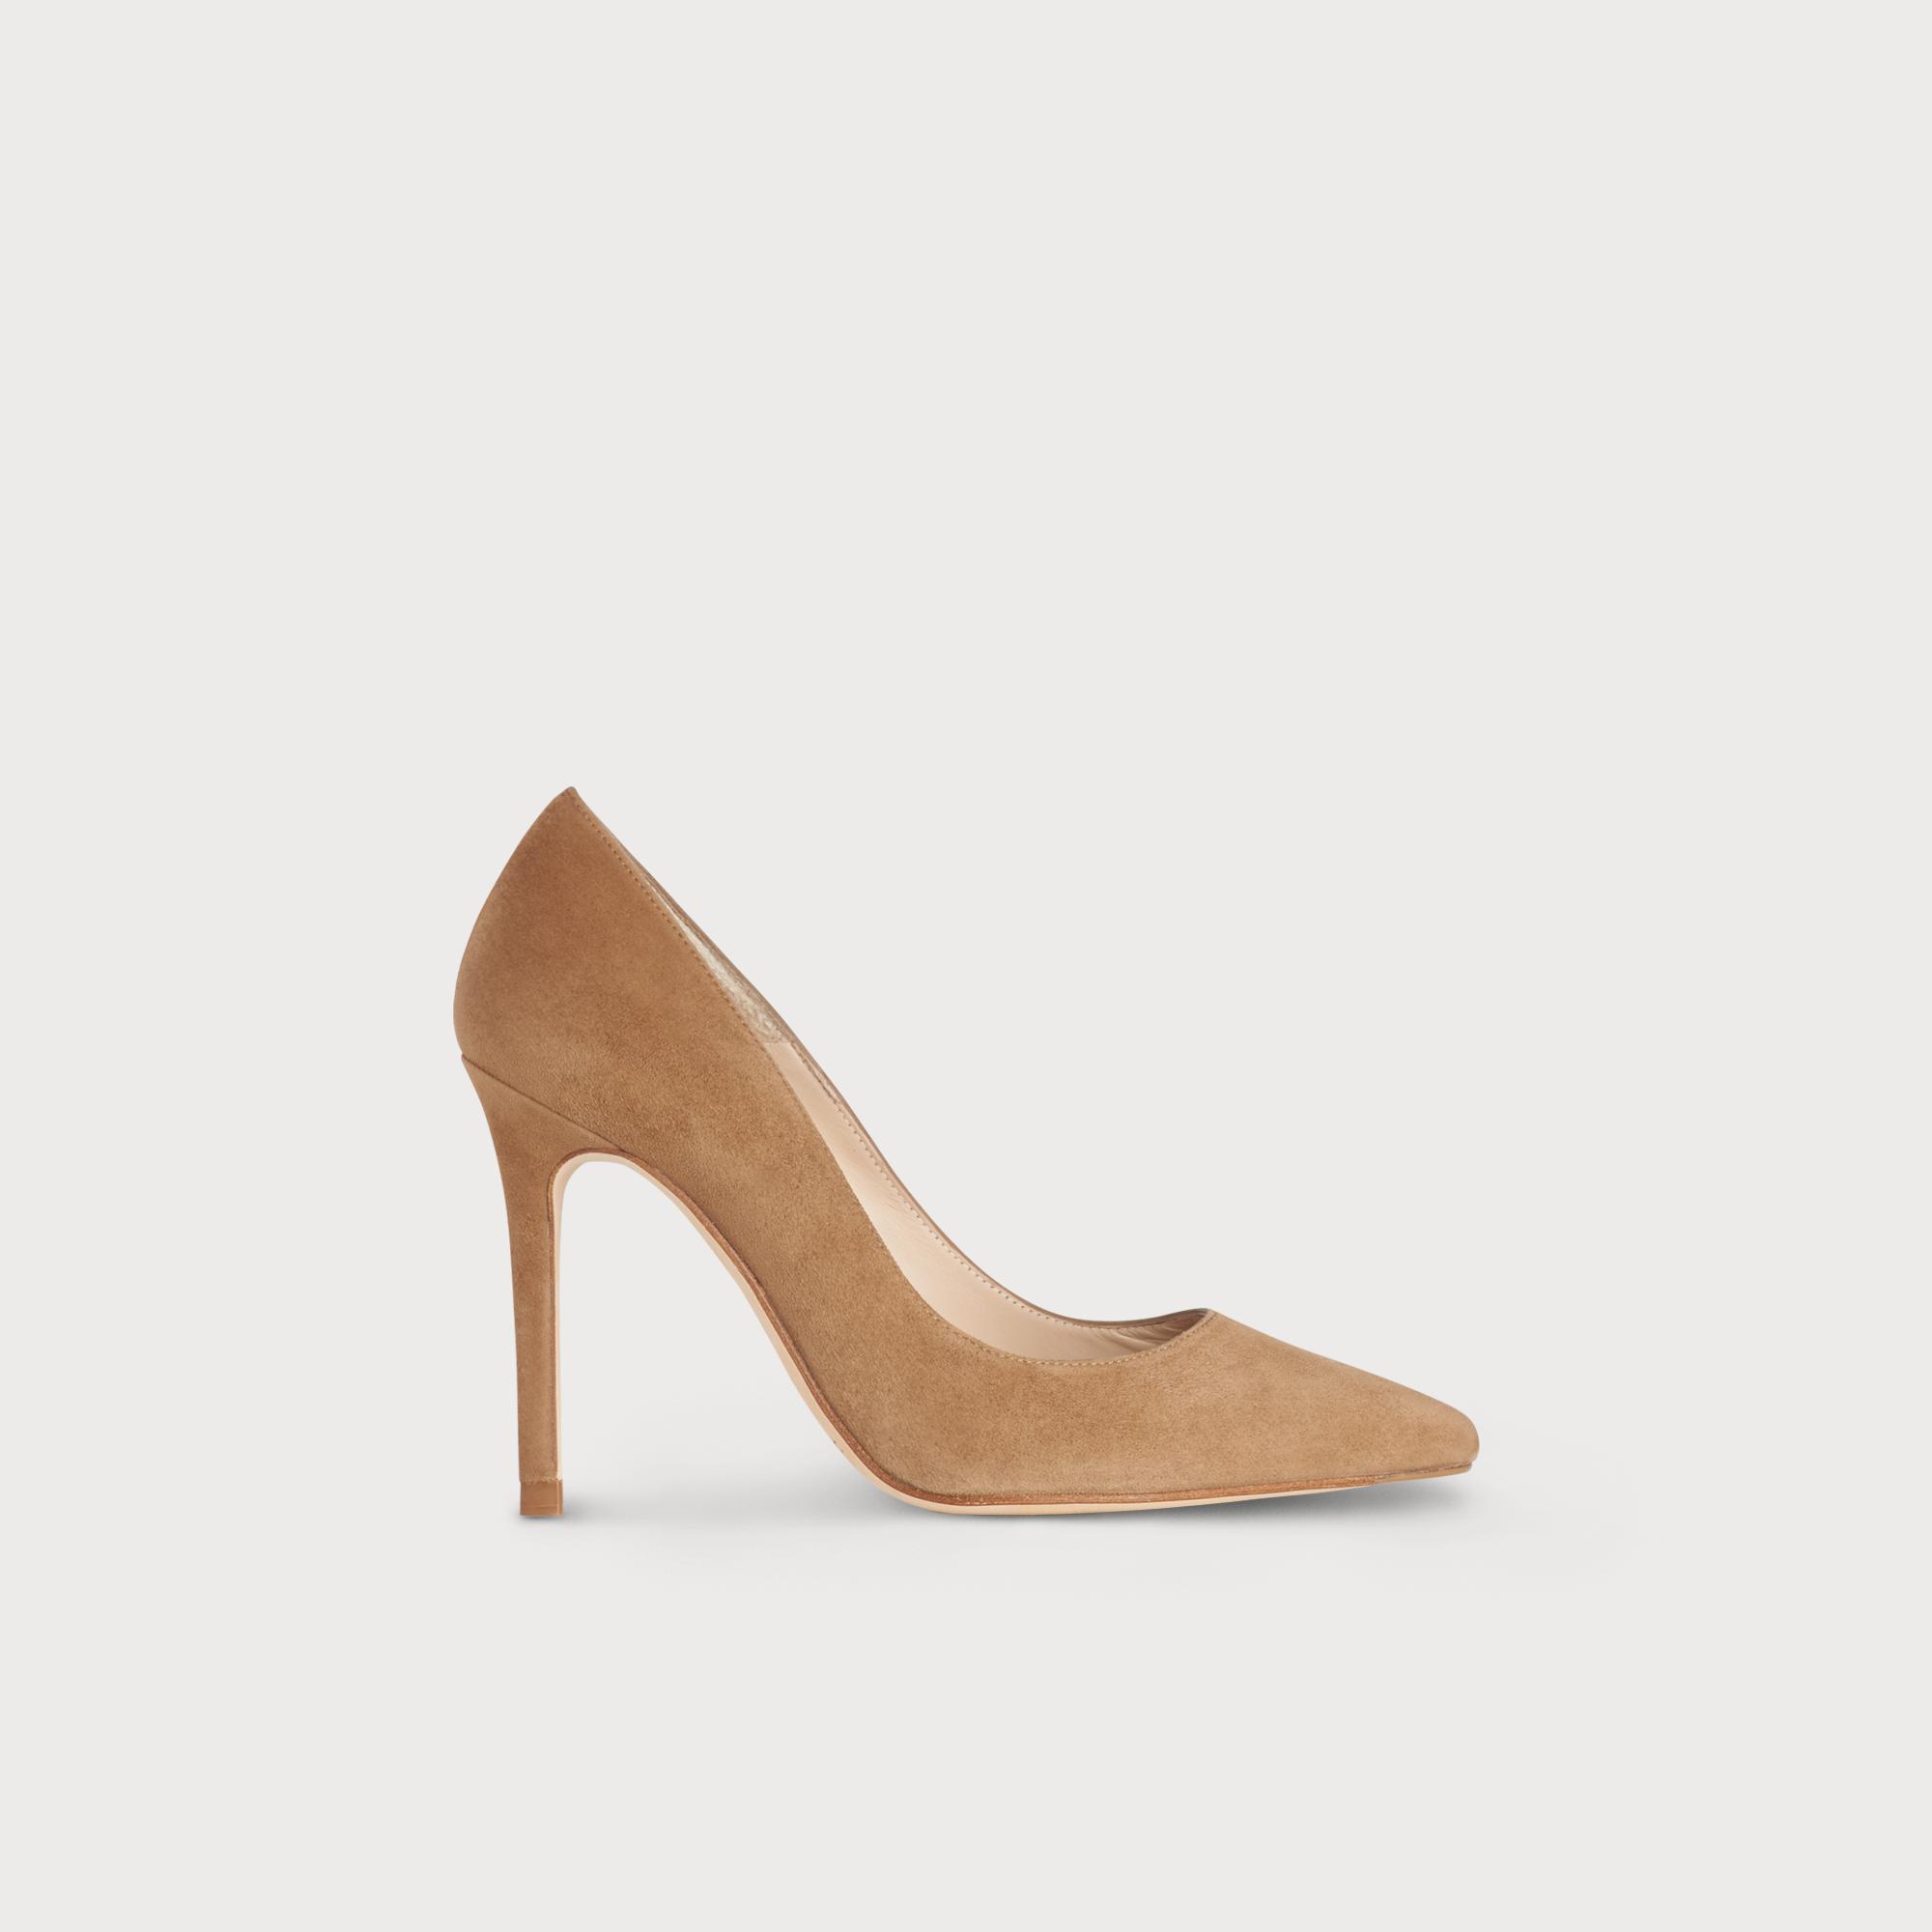 a0c418f995c Fern Light Brown Suede Heel